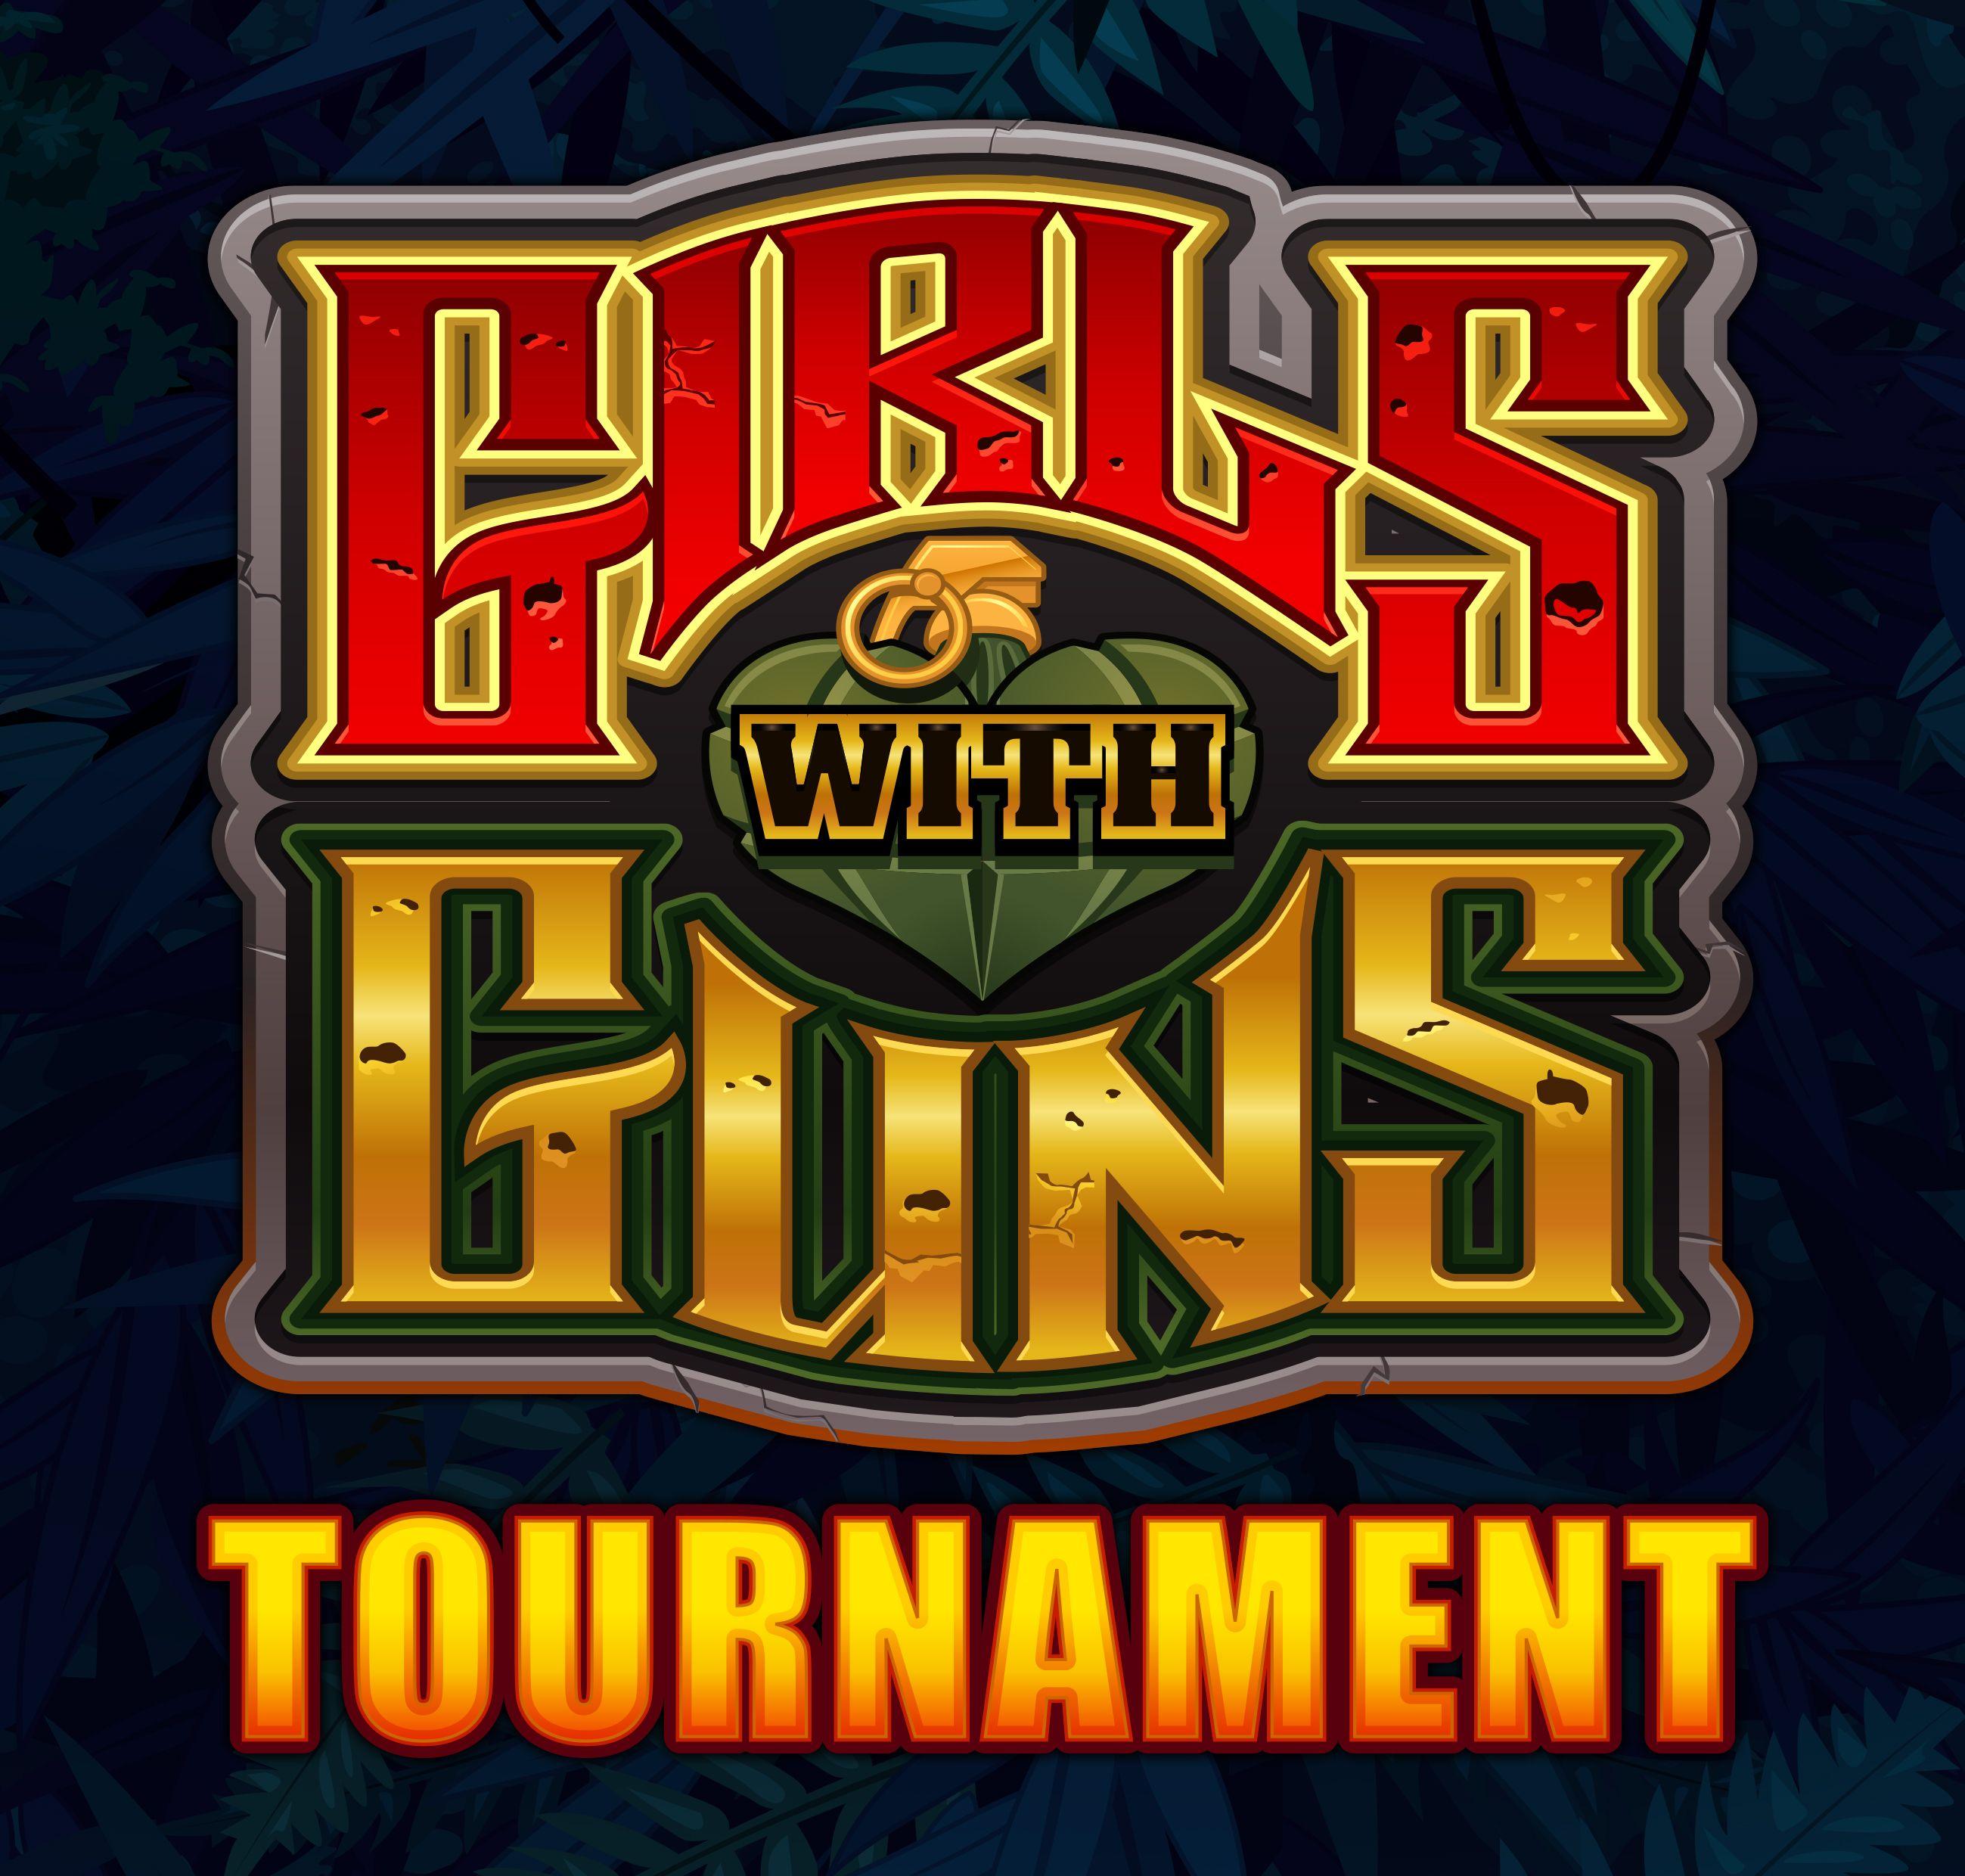 Girls with guns tournament game logo online casino casino